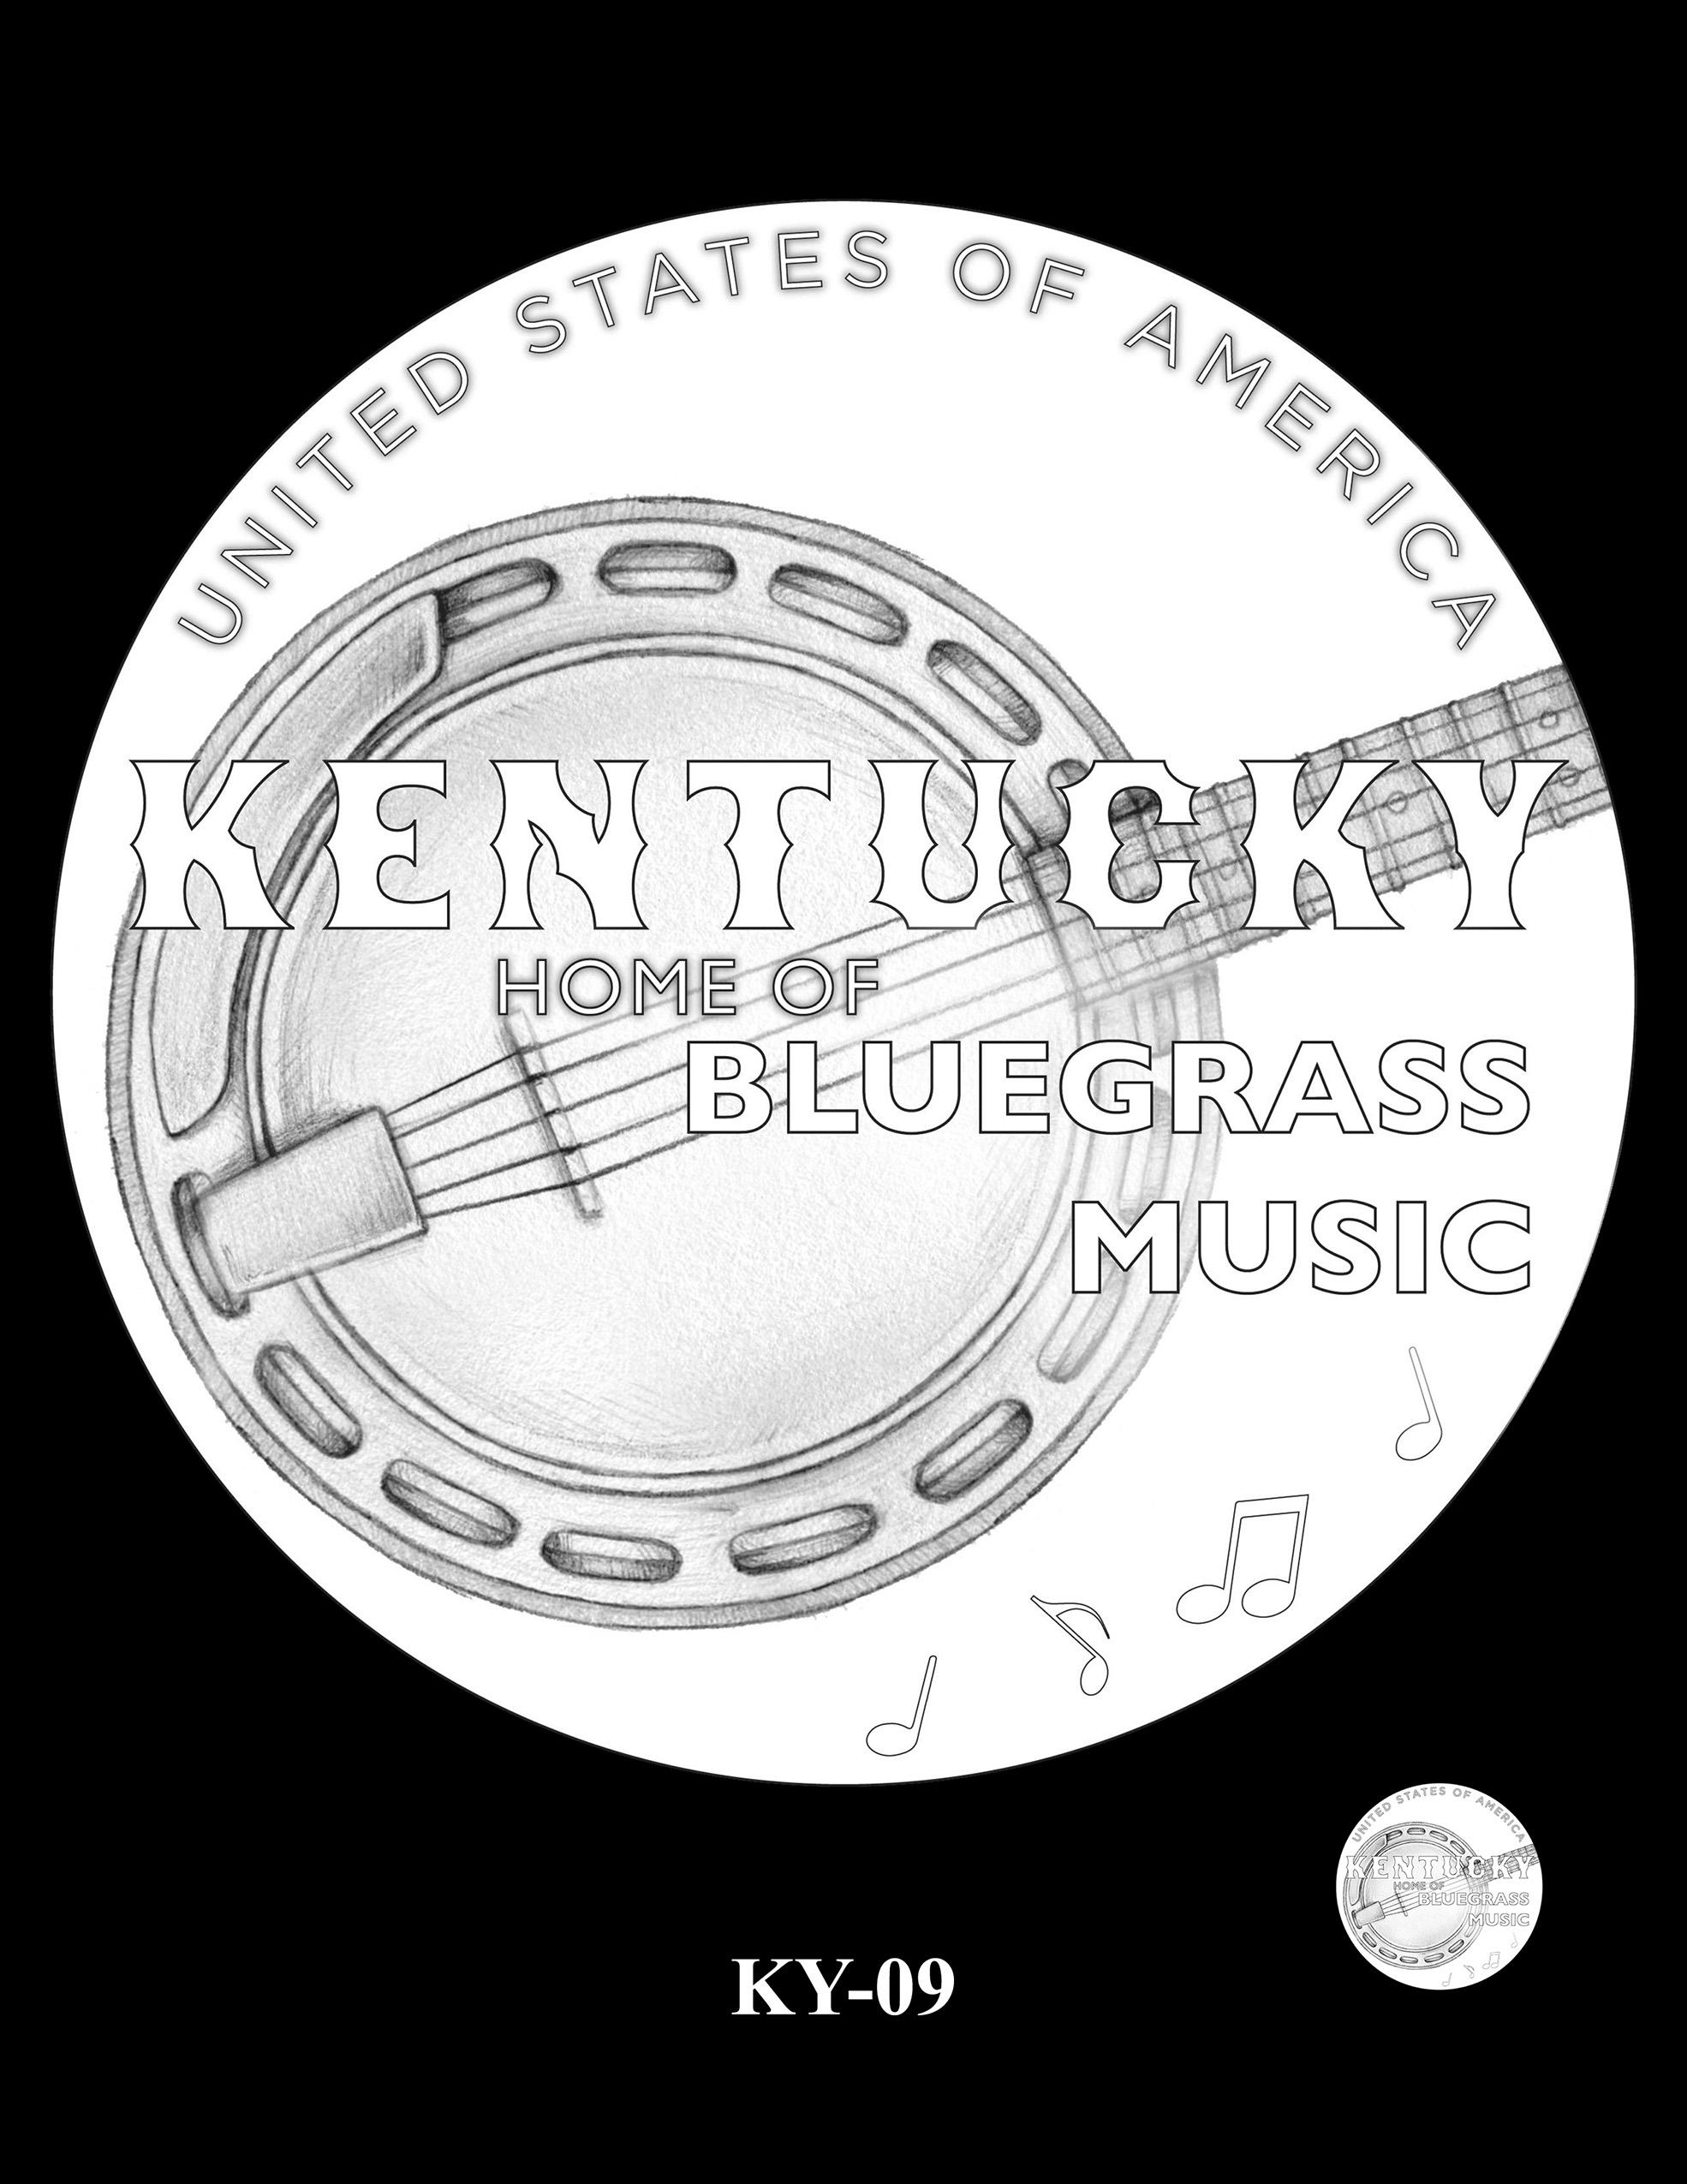 KY-09 -- 2022 American Innovation $1 Coin - Kentucky